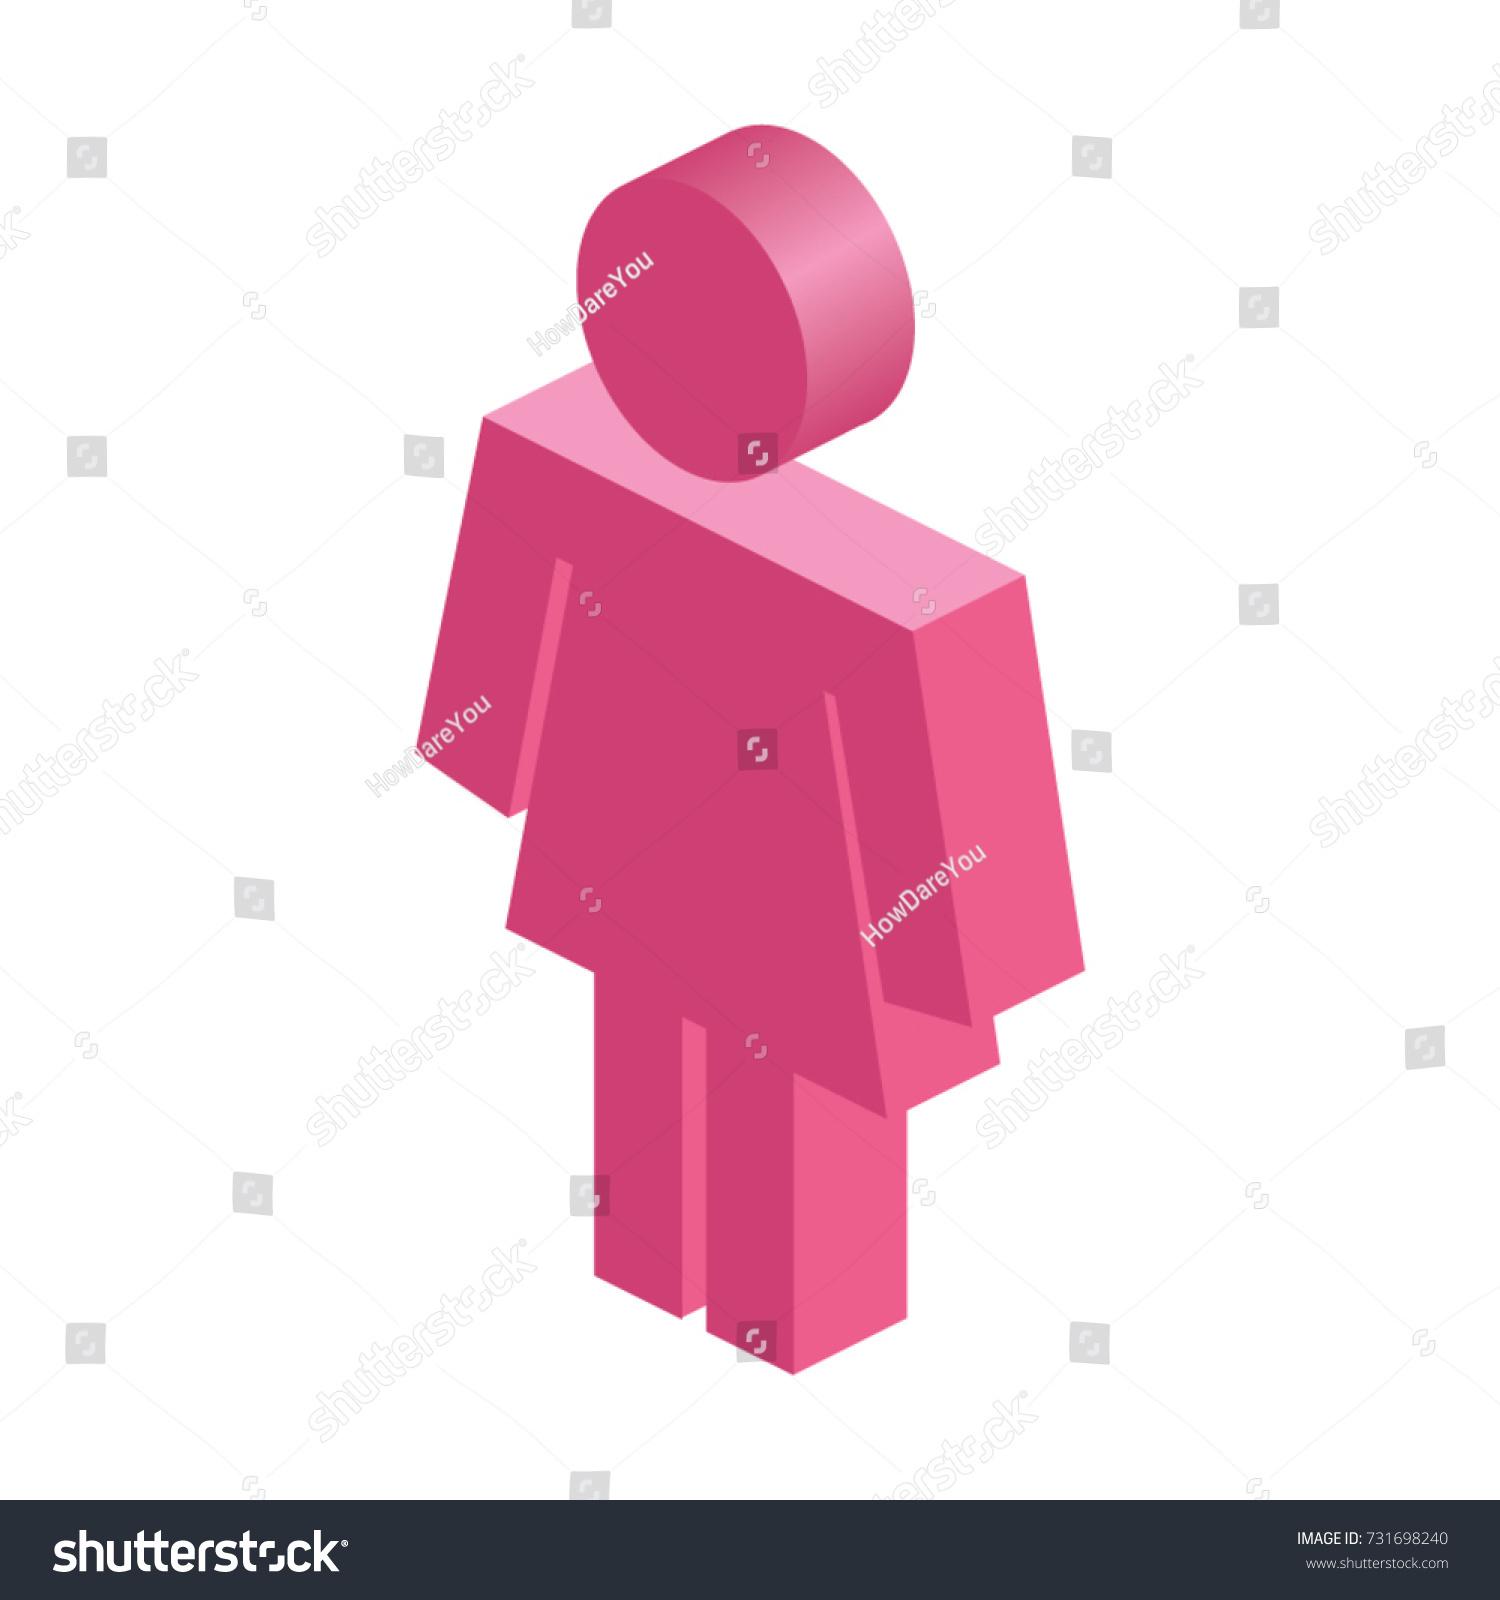 Isometric Female Symbol Stock Vector Royalty Free 731698240